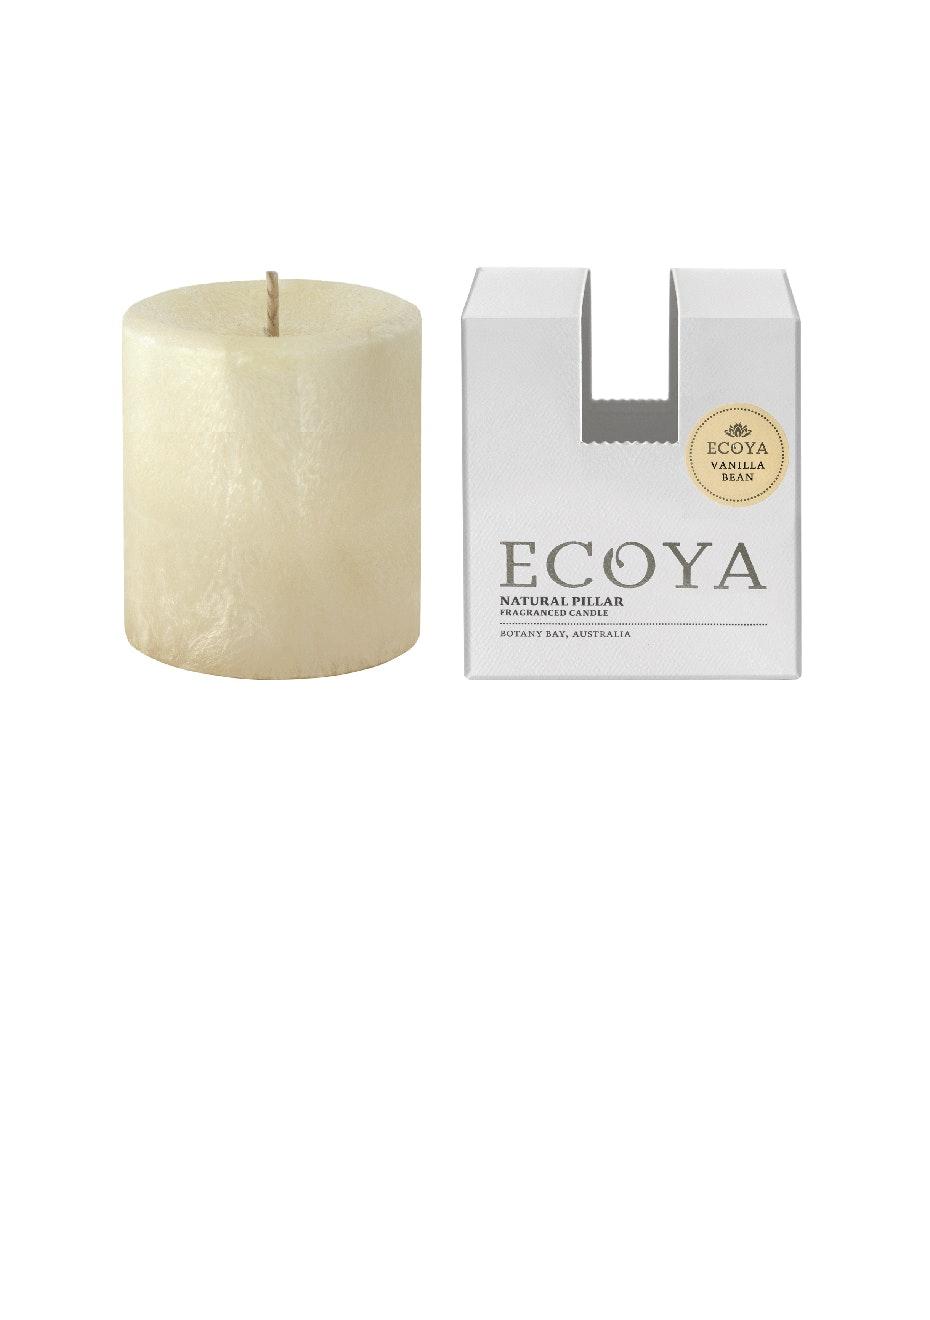 Ecoya - Pillar 75x85 Natural - Vanilla Bean